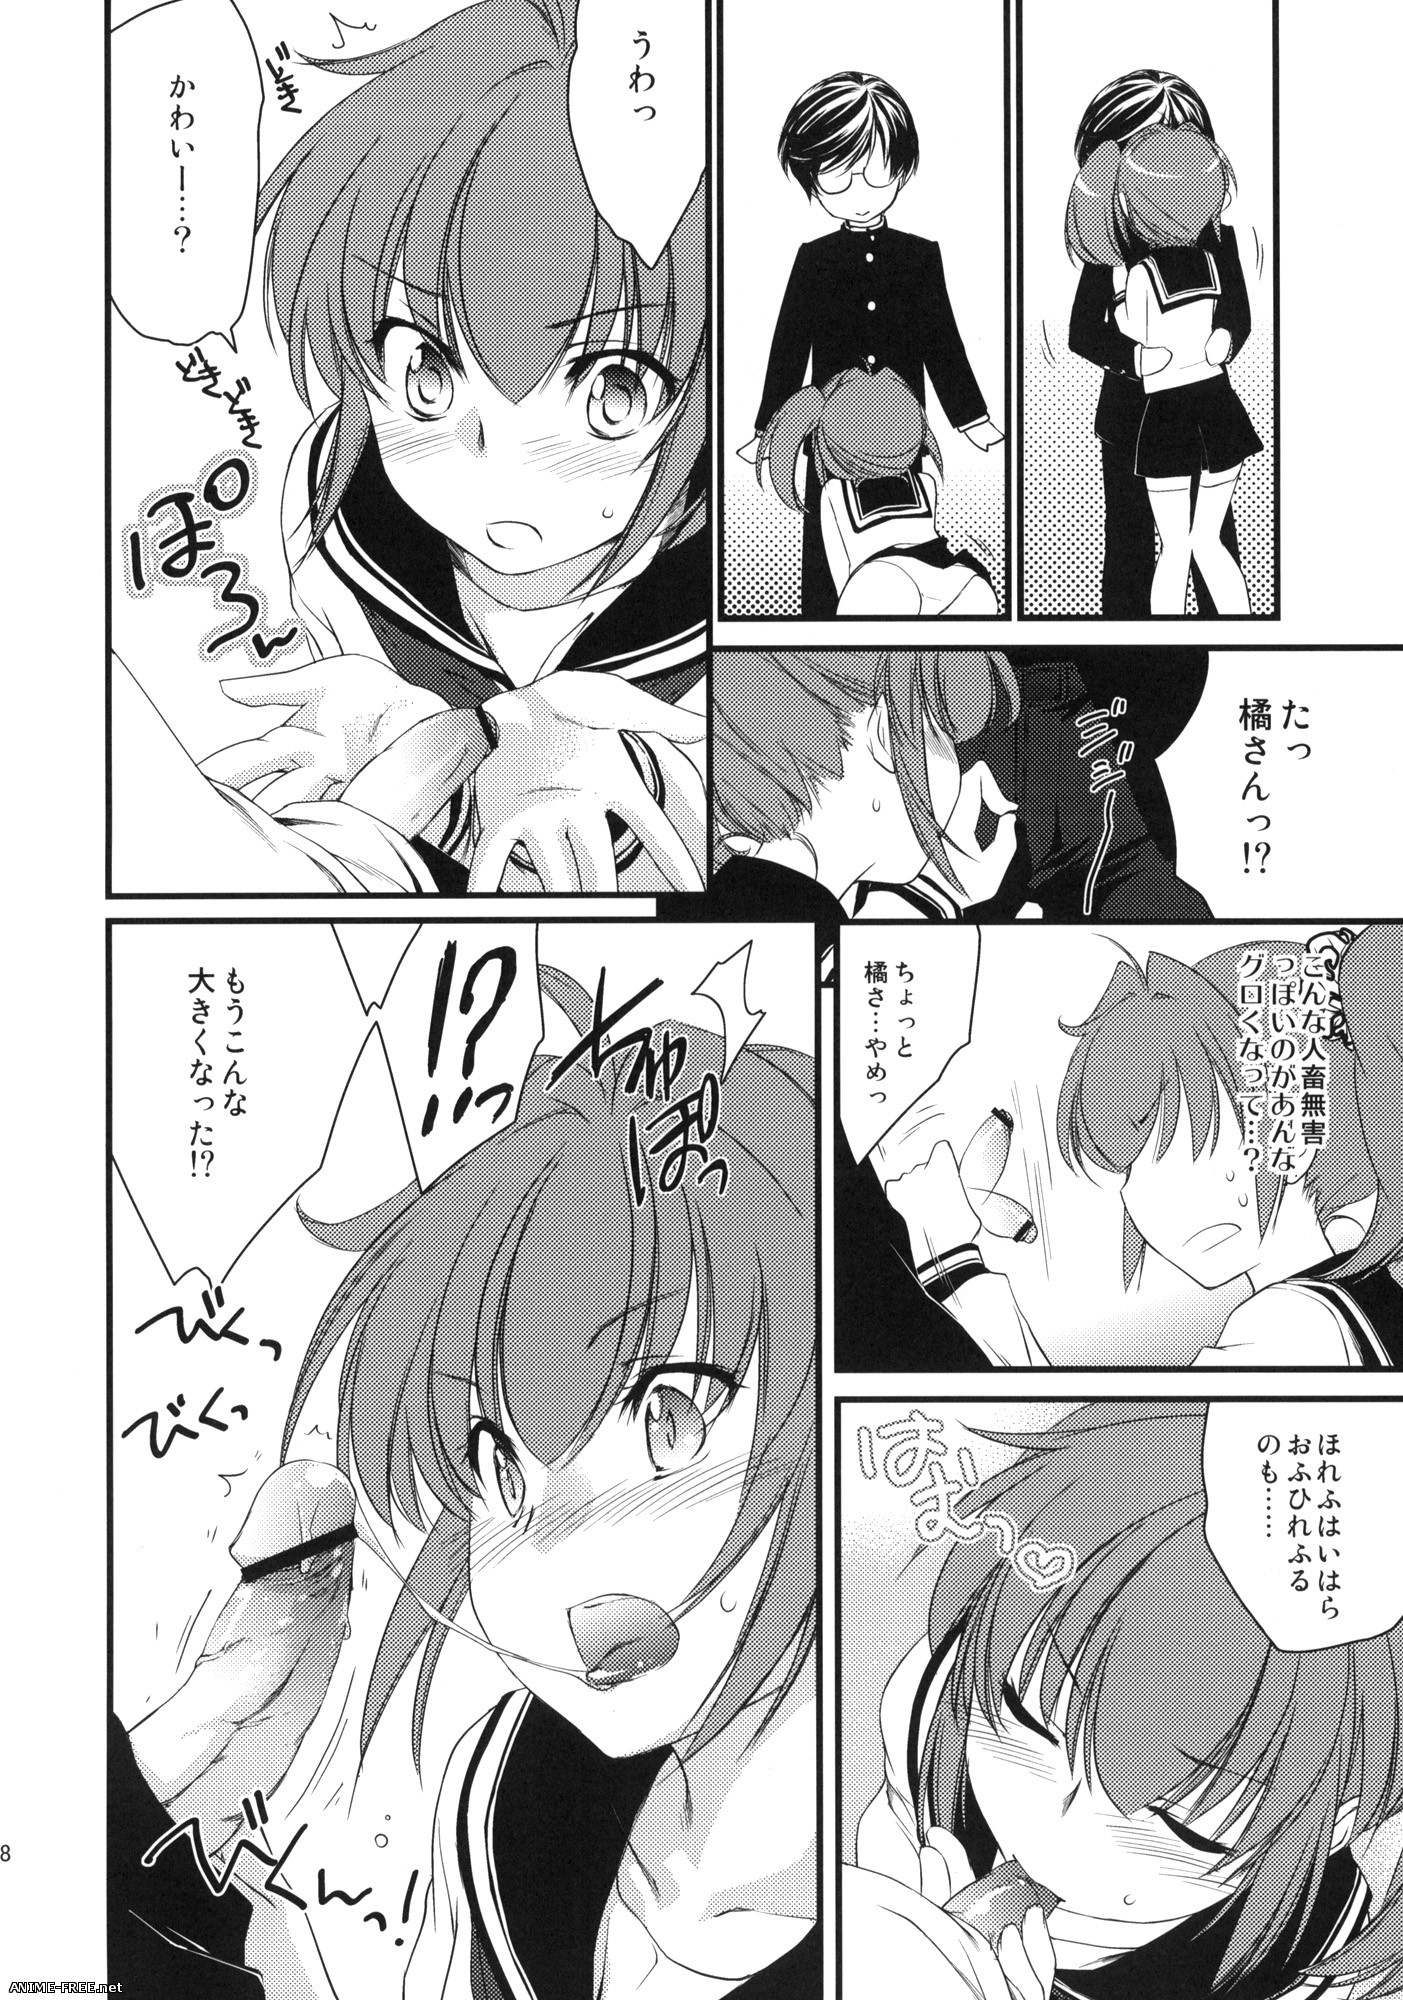 Yuuki Homura (Homura's R Comics) - Сборник хентай манги [Cen] [ENG,RUS,JAP] Manga Hentai